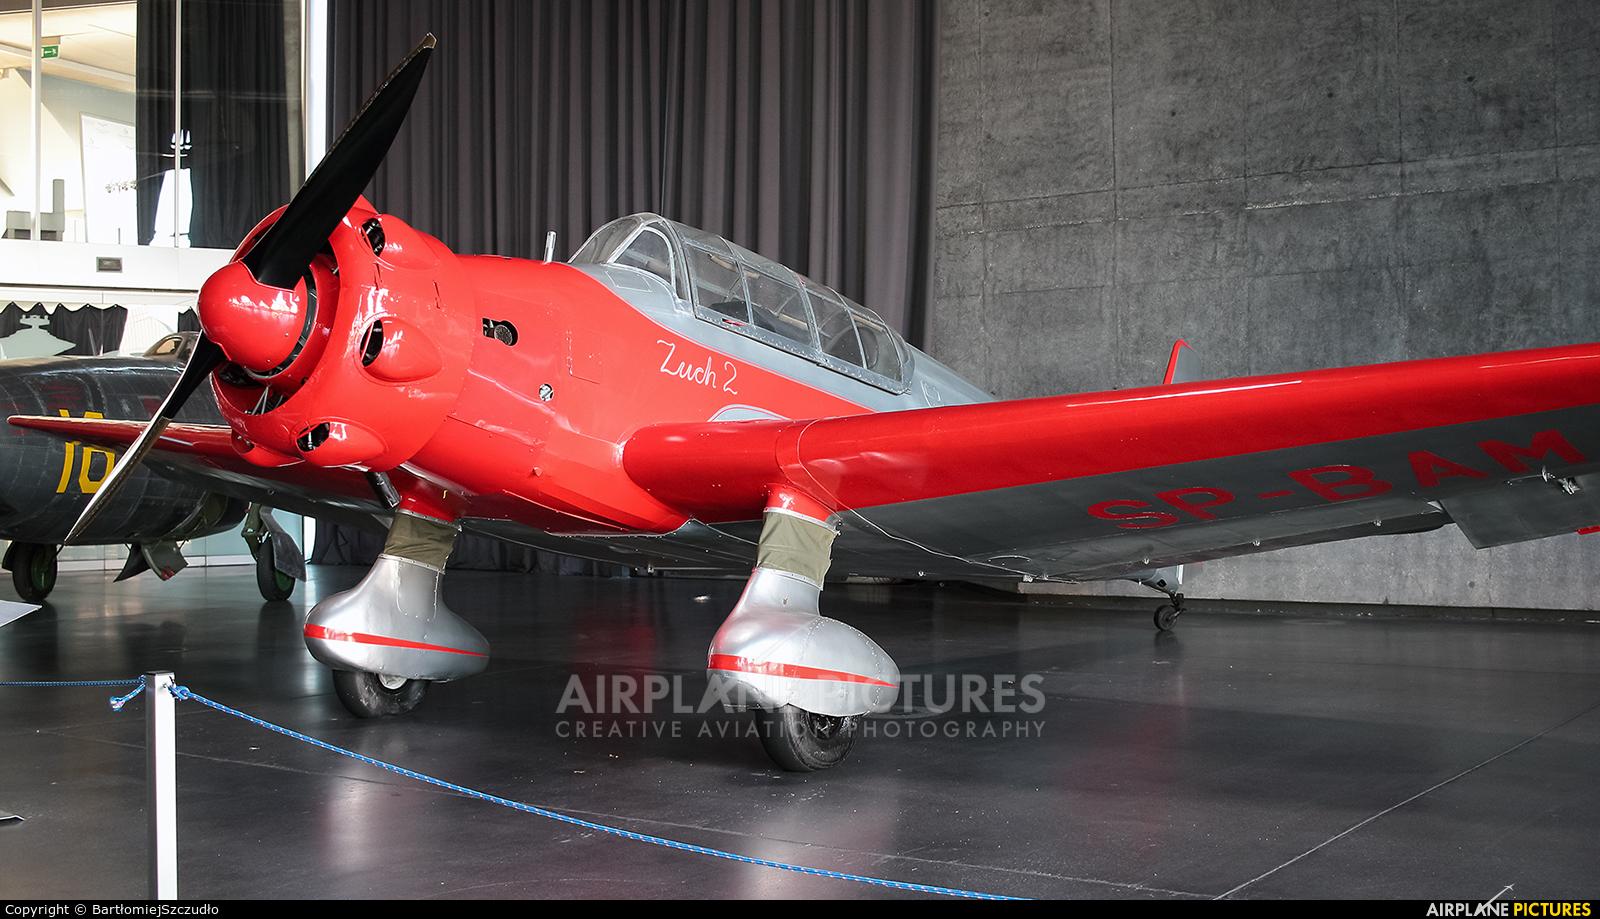 Private SP-BAM aircraft at Kraków, Rakowice Czyżyny - Museum of Polish Aviation